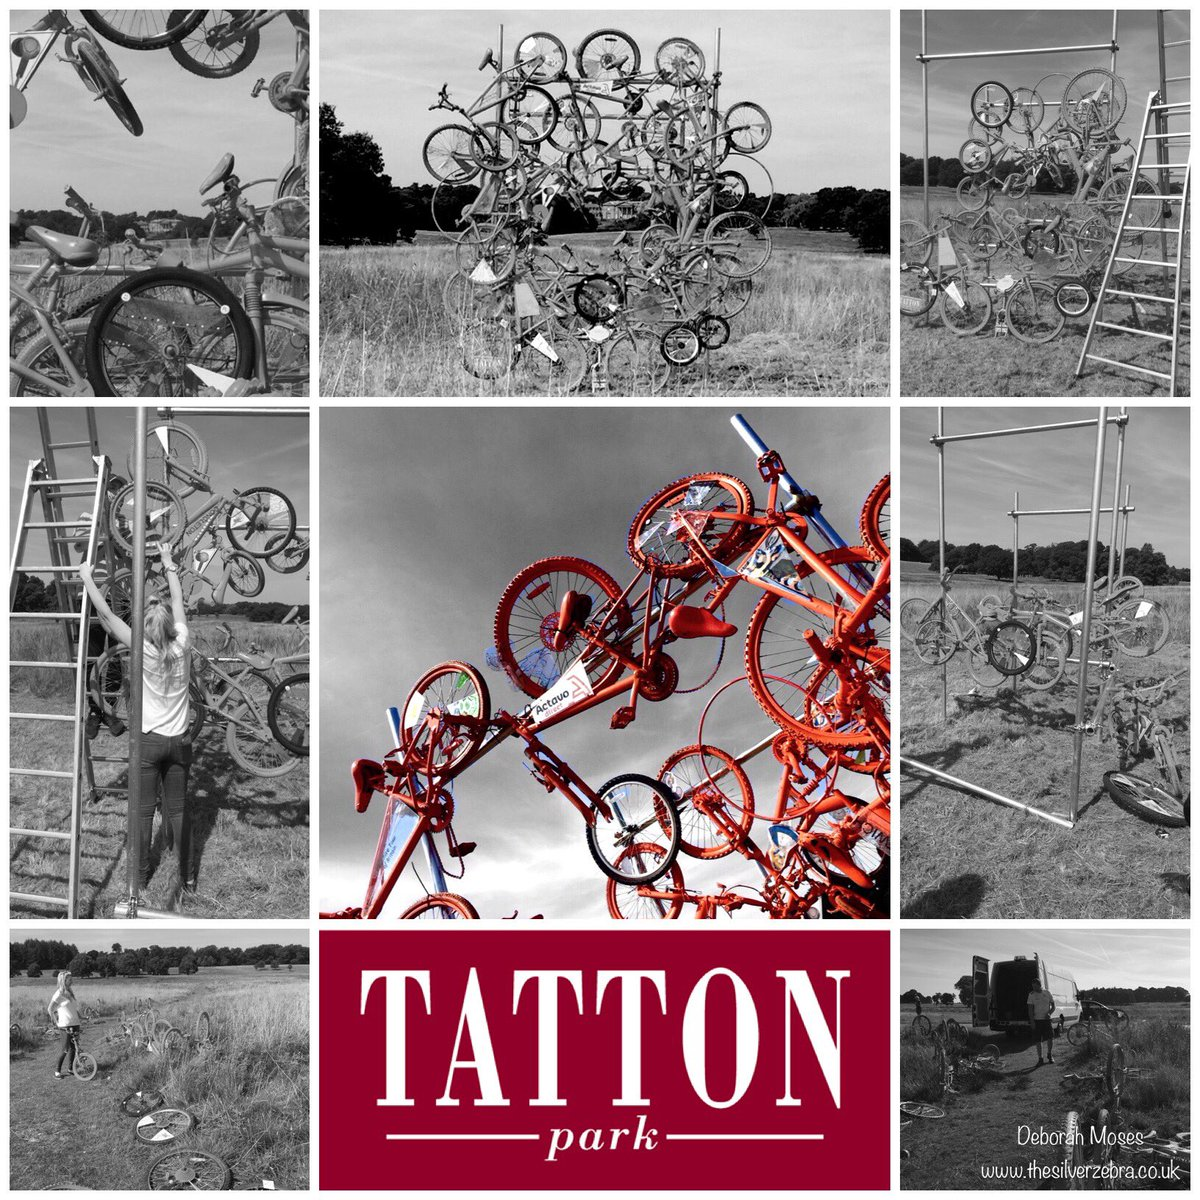 Visiting @tatton_park this wk? Don't forget to tweet your photo #tsztob